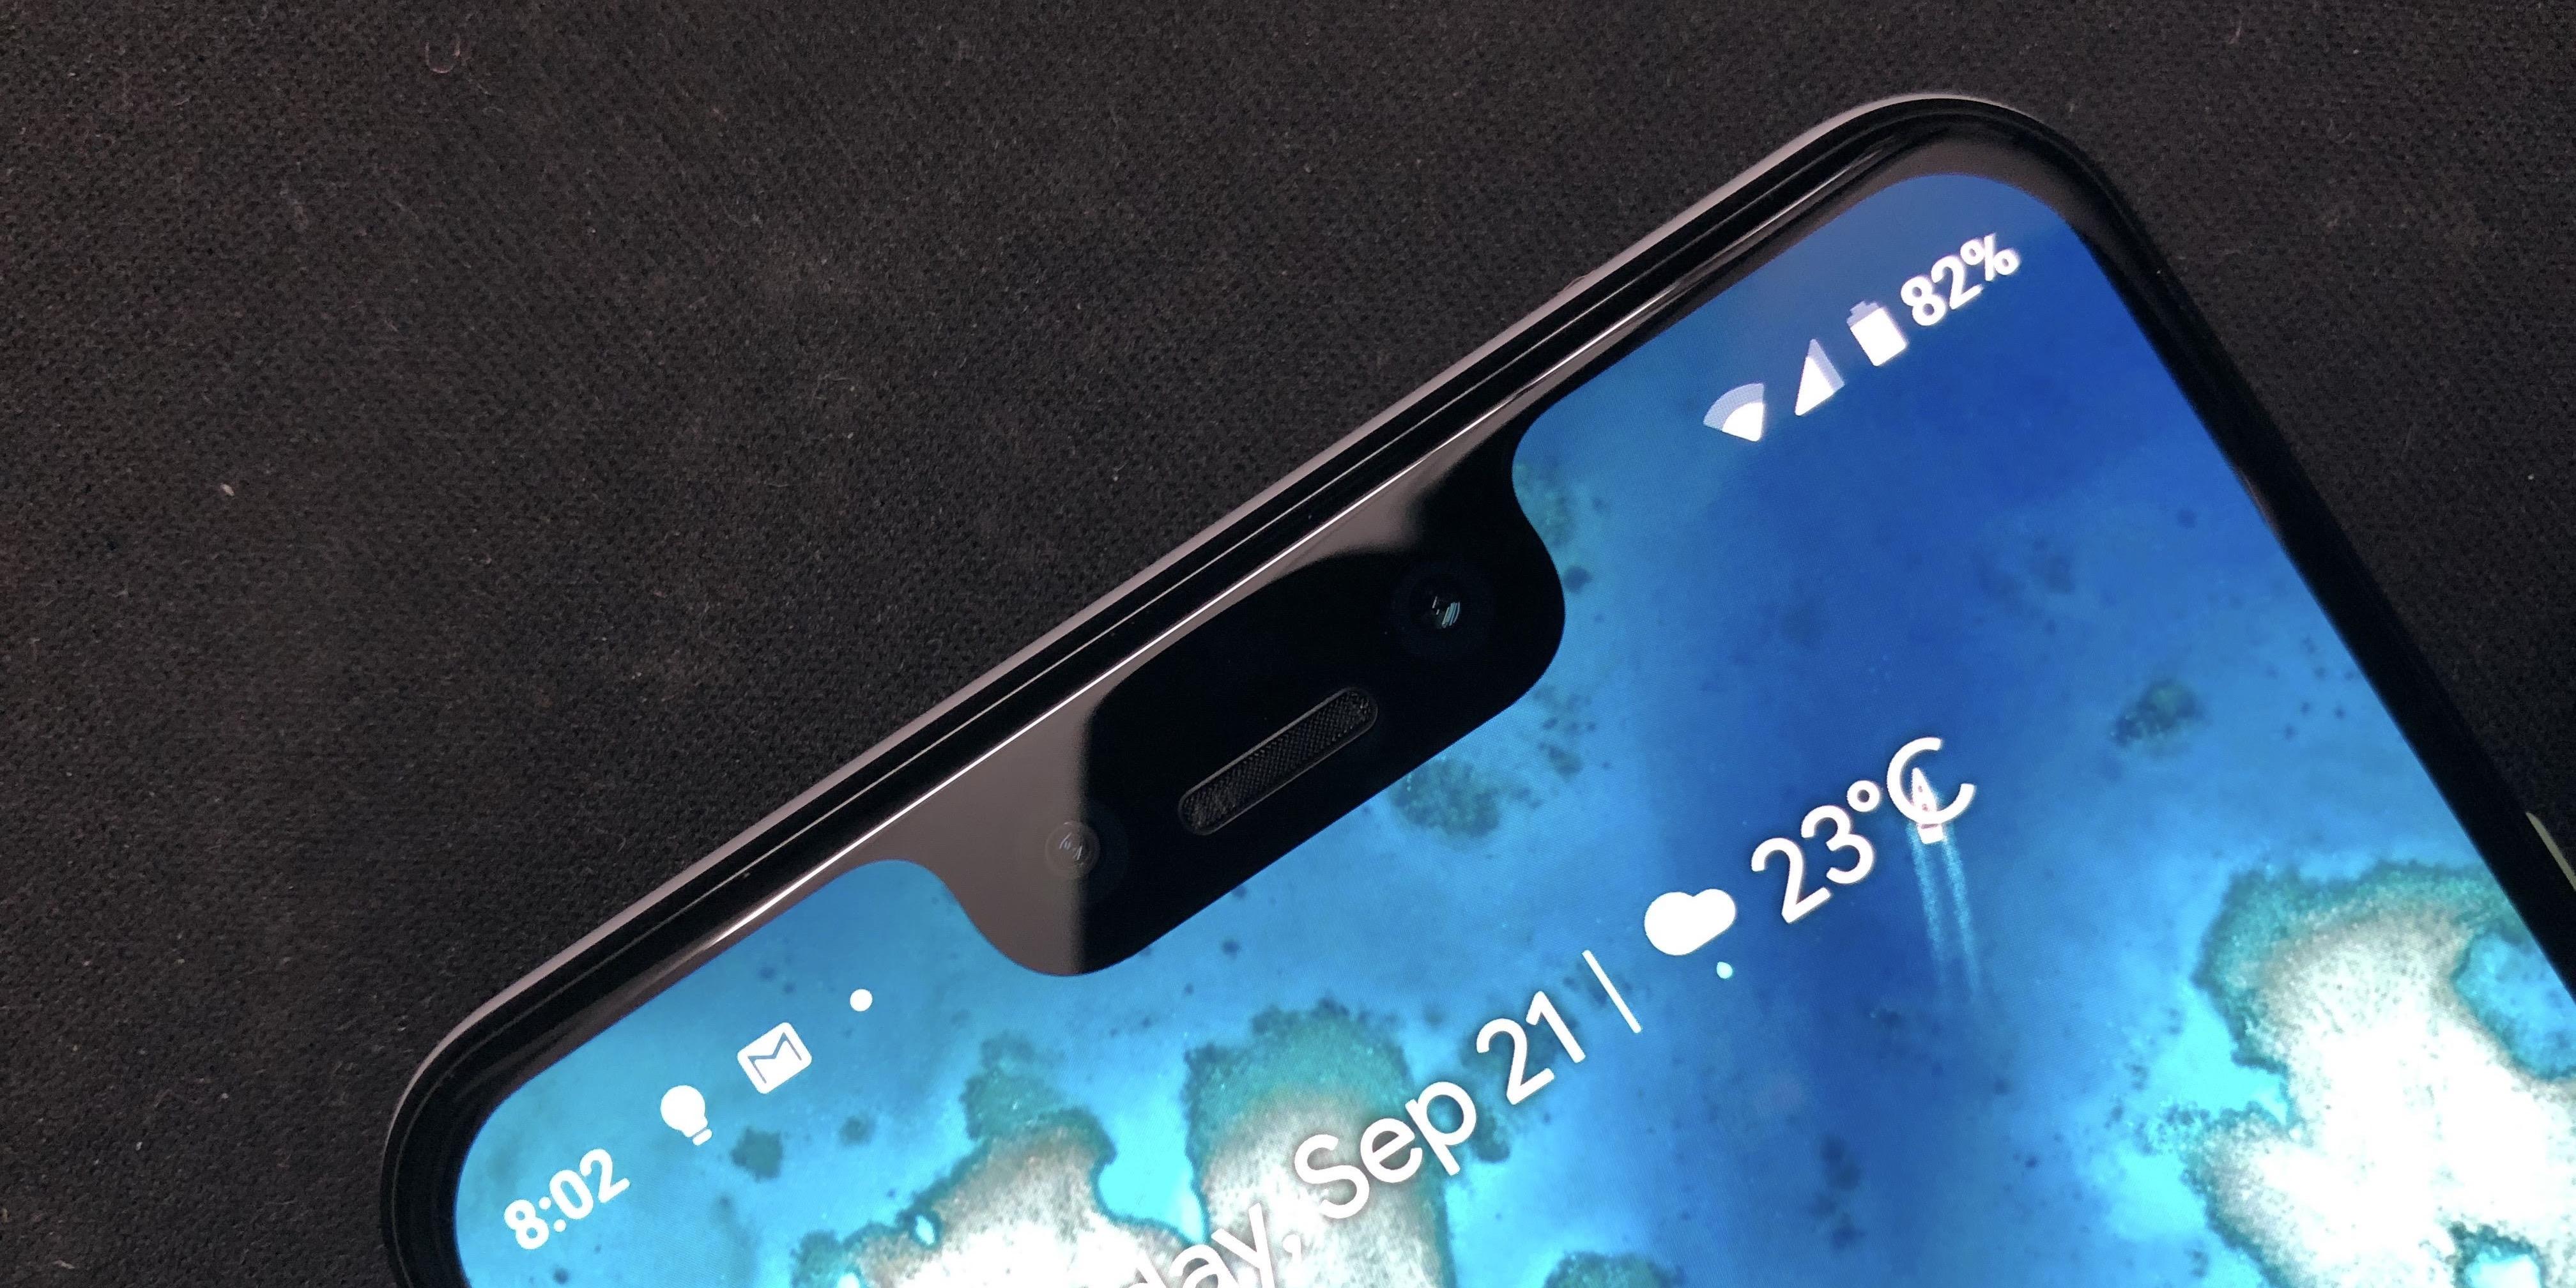 latest pixel 3 xl leak focusses on dual front facing cameras new google assistant ui